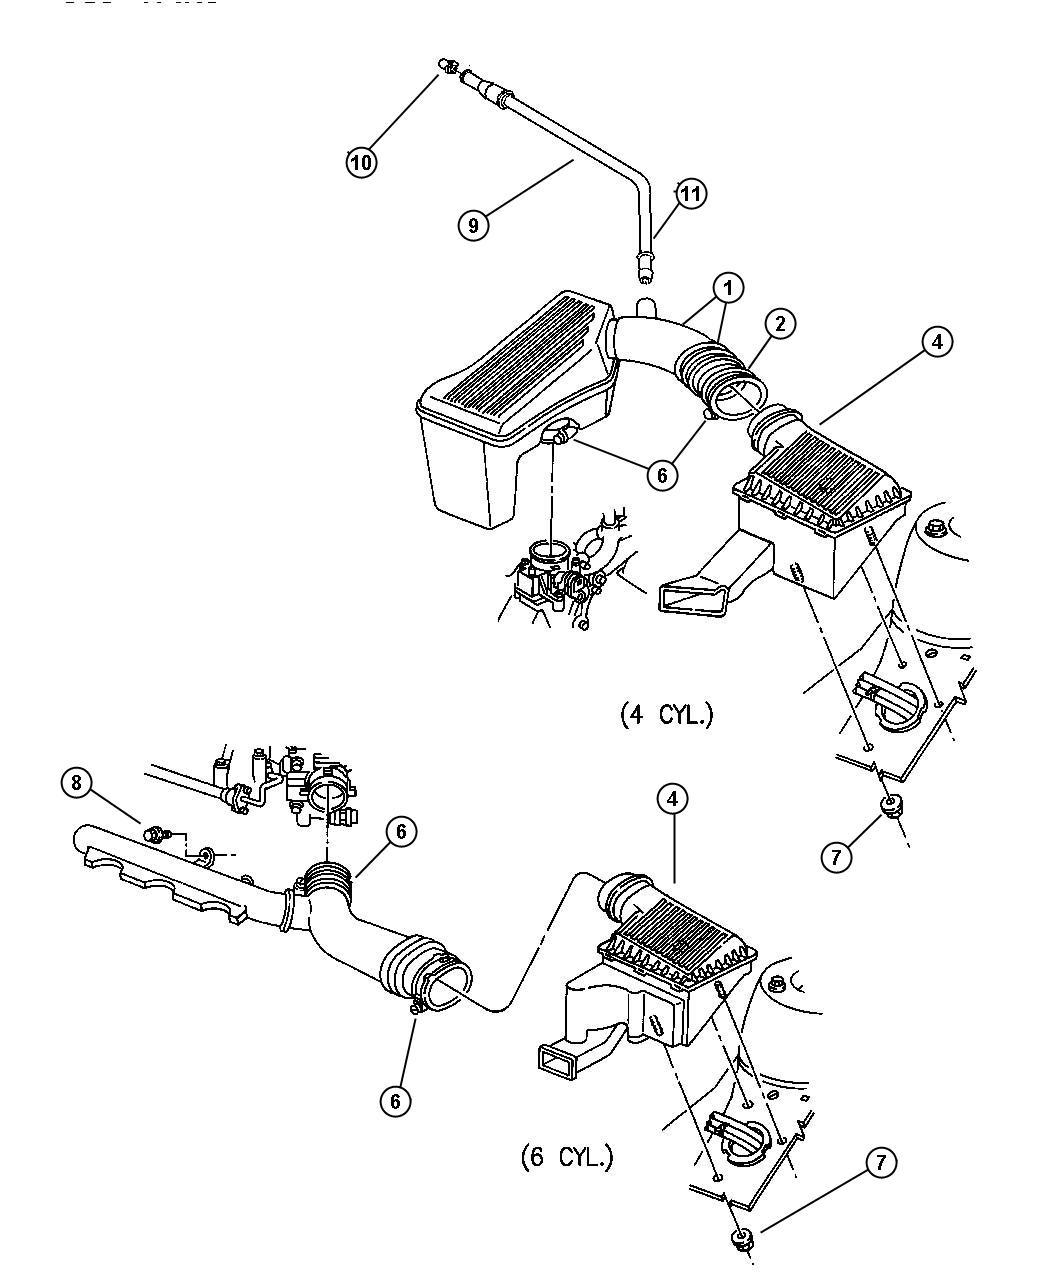 Dodge Stratus Element Air Cleaner Engine Filter